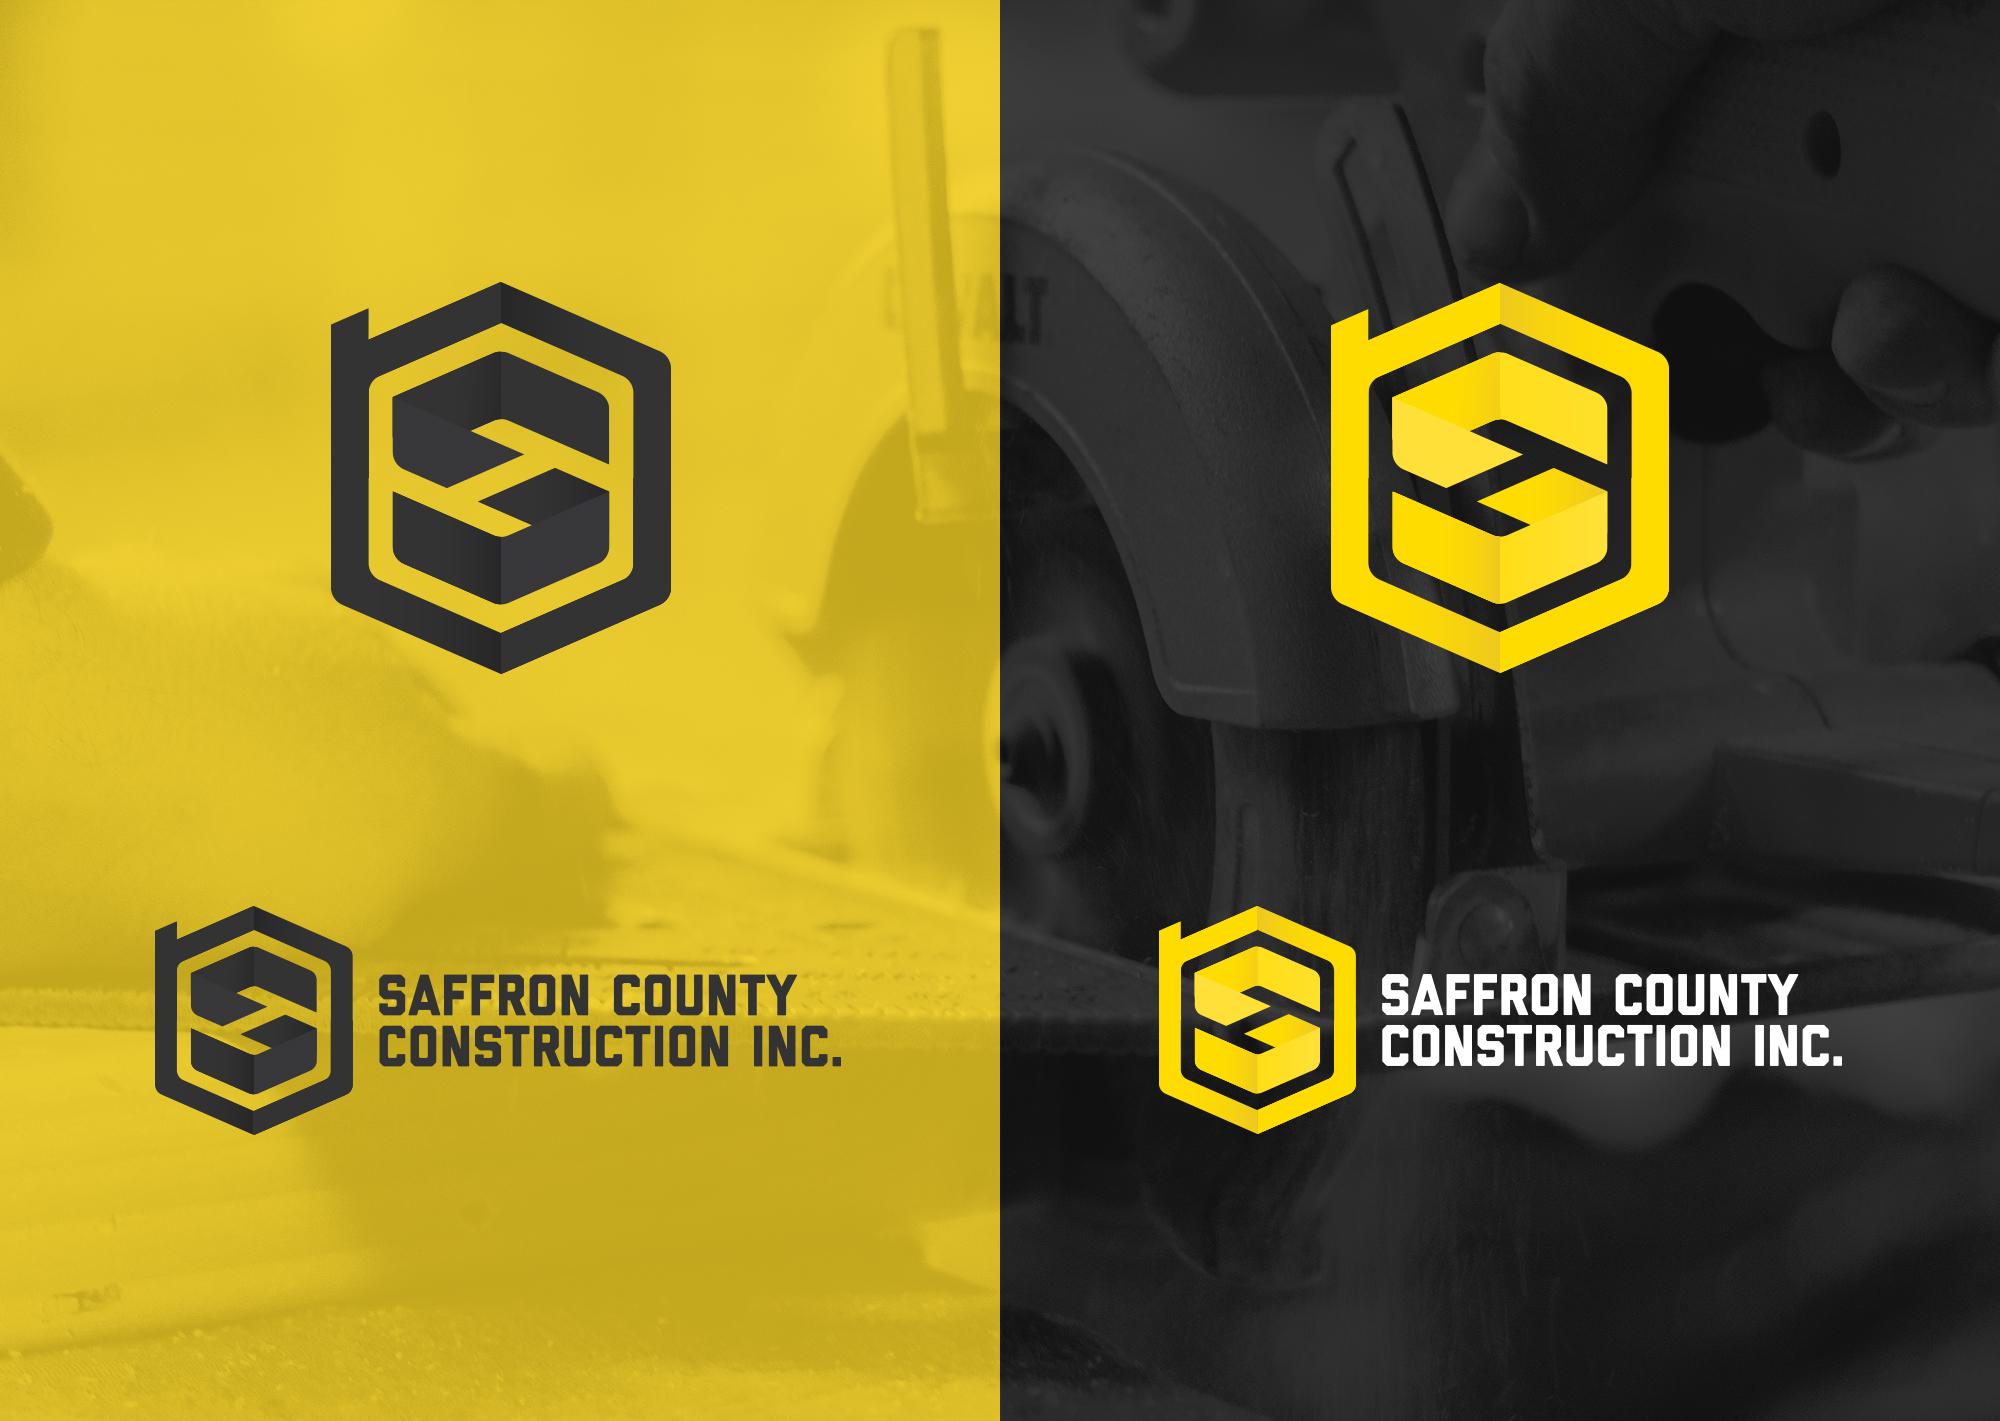 SCC_logo_yellow-black.jpg